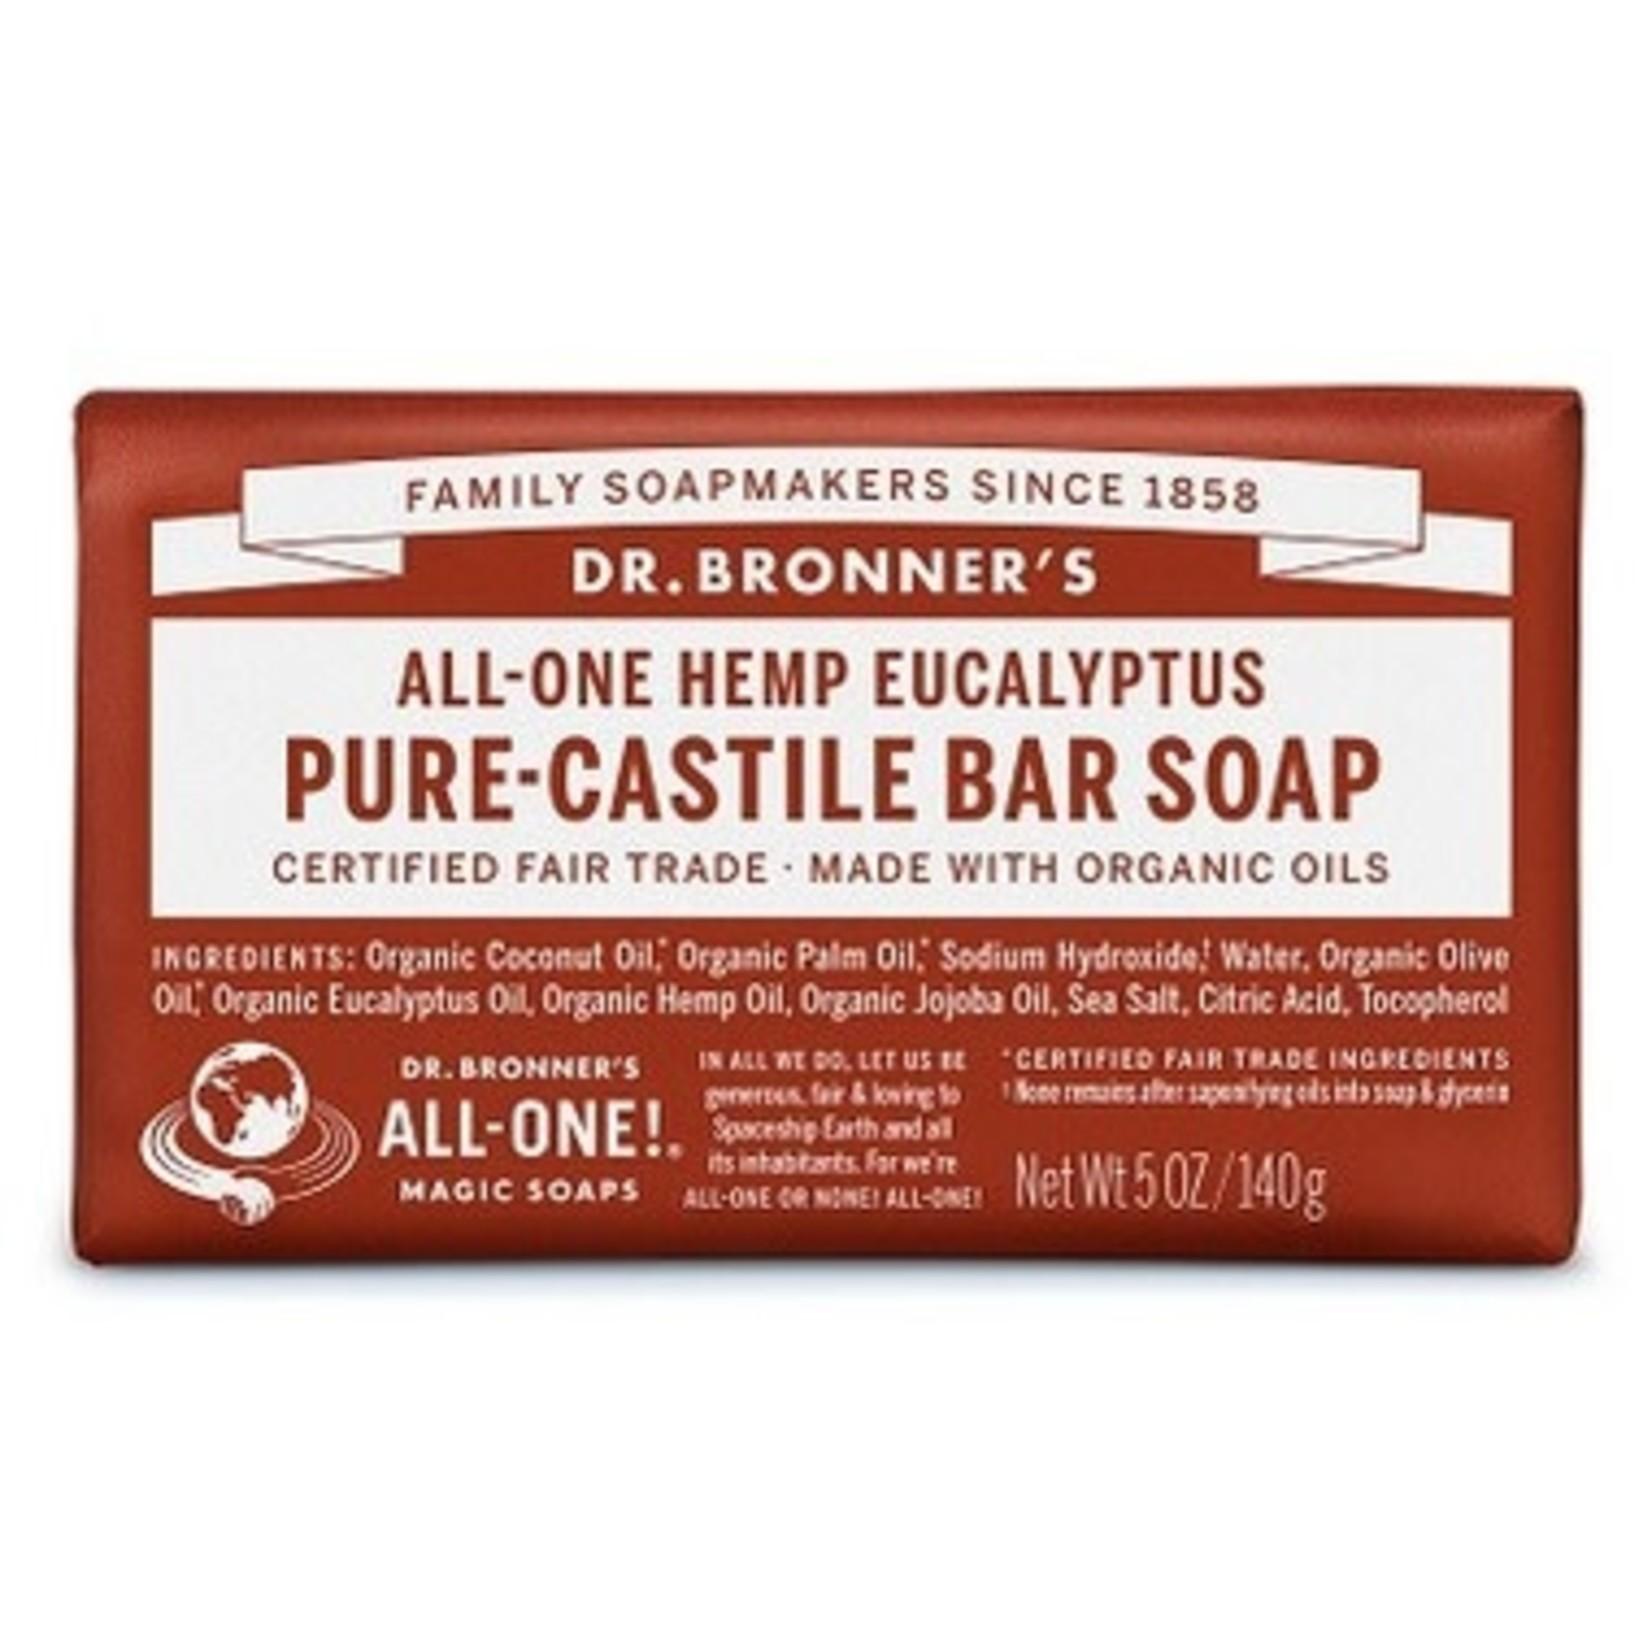 DR. BRONNER'S PURE CASTILE SOAP - EUCALYPTUS